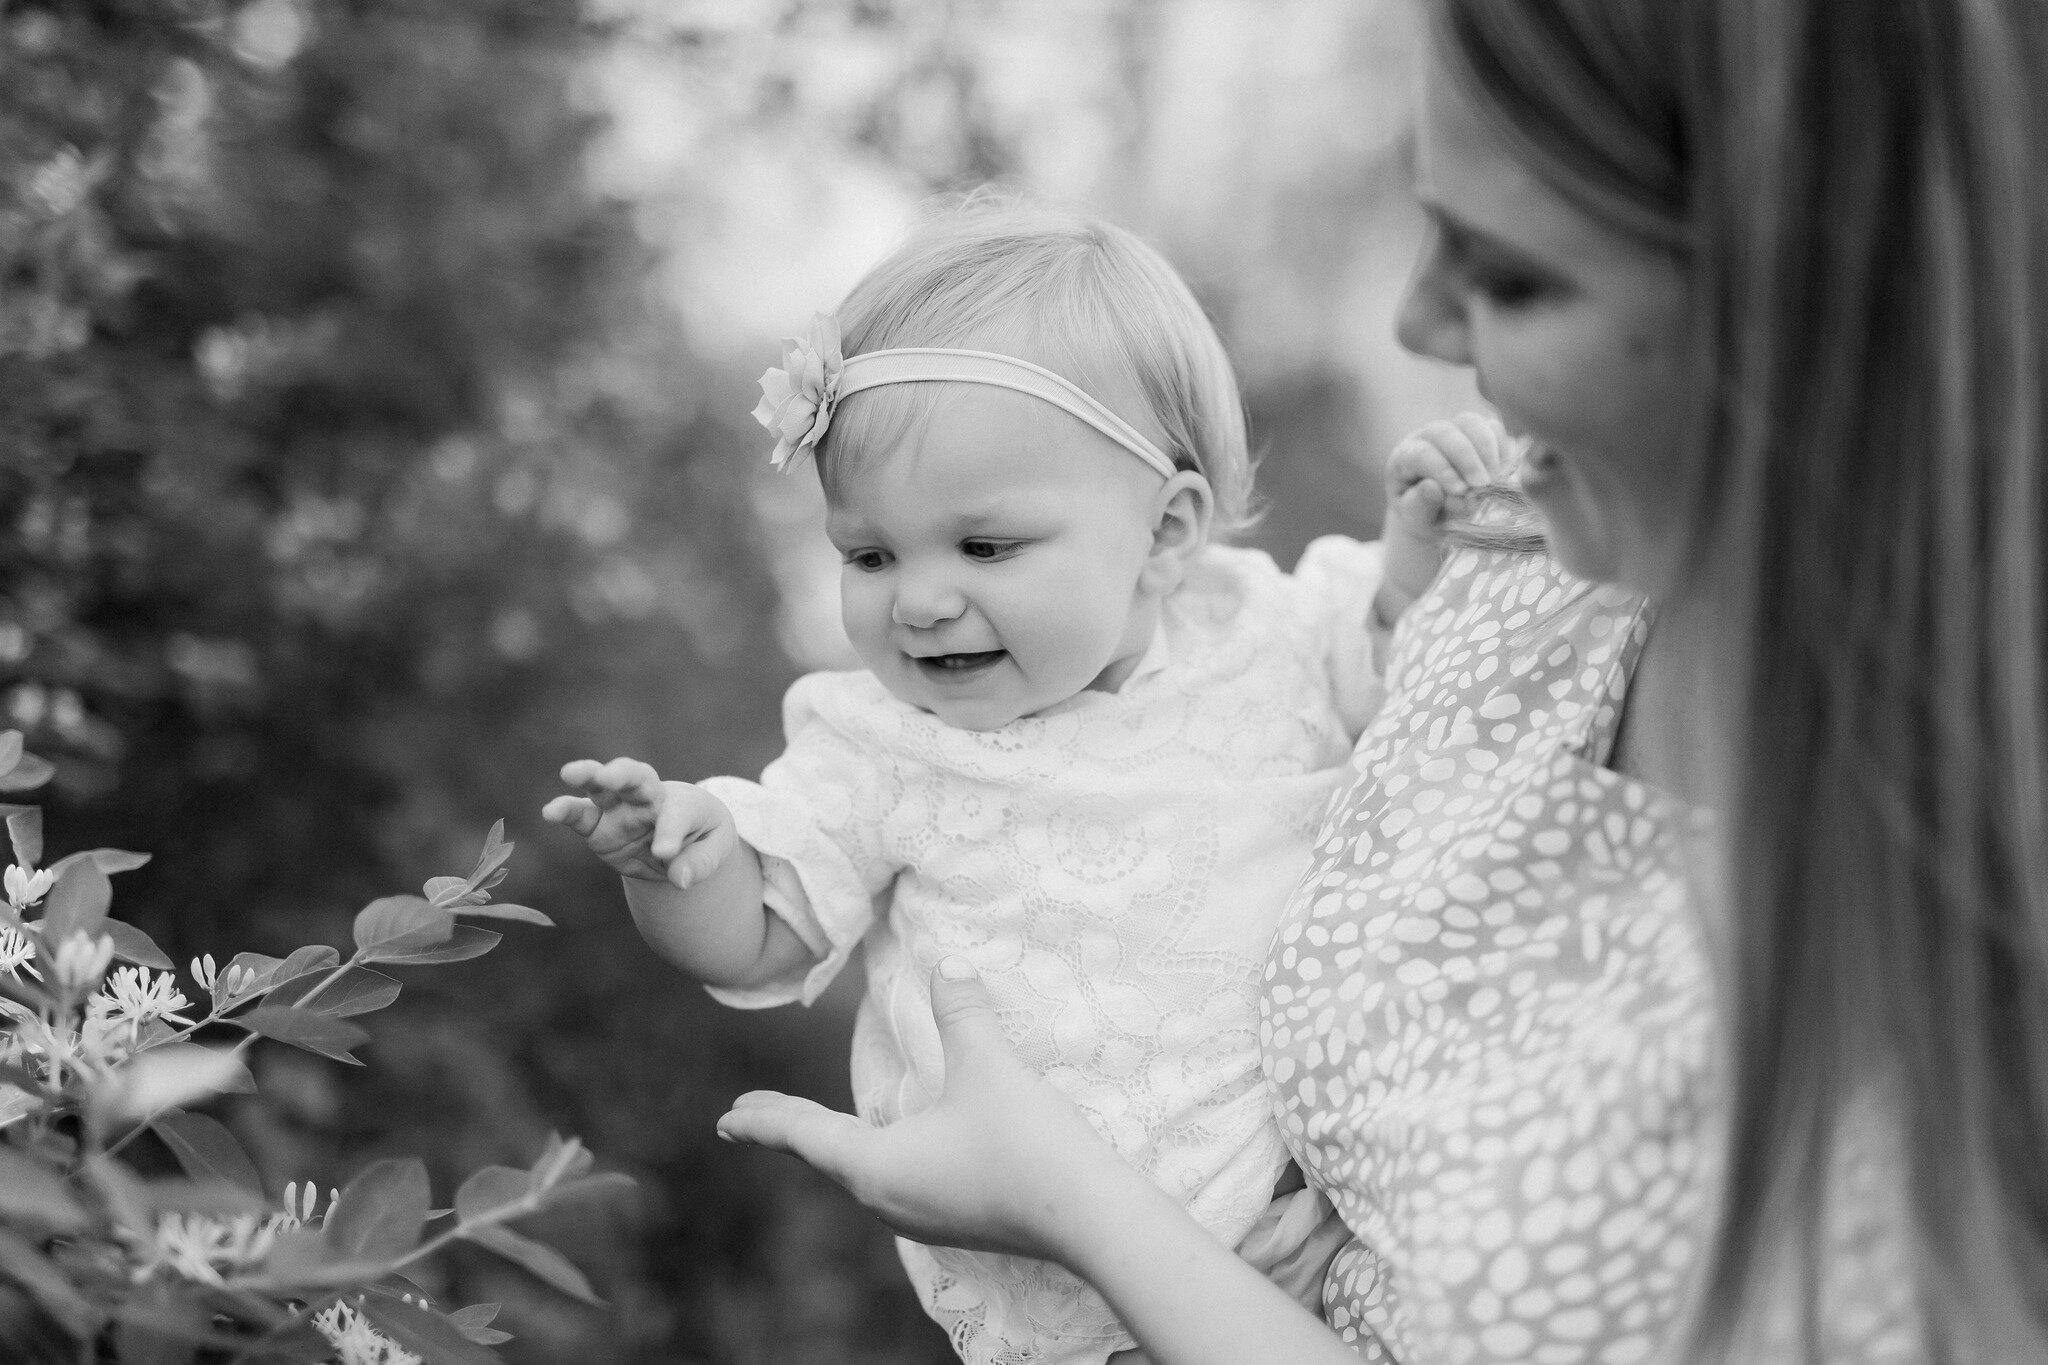 ct motherhood session_motherhood story CT_motherhood photographcer CT_12.jpg